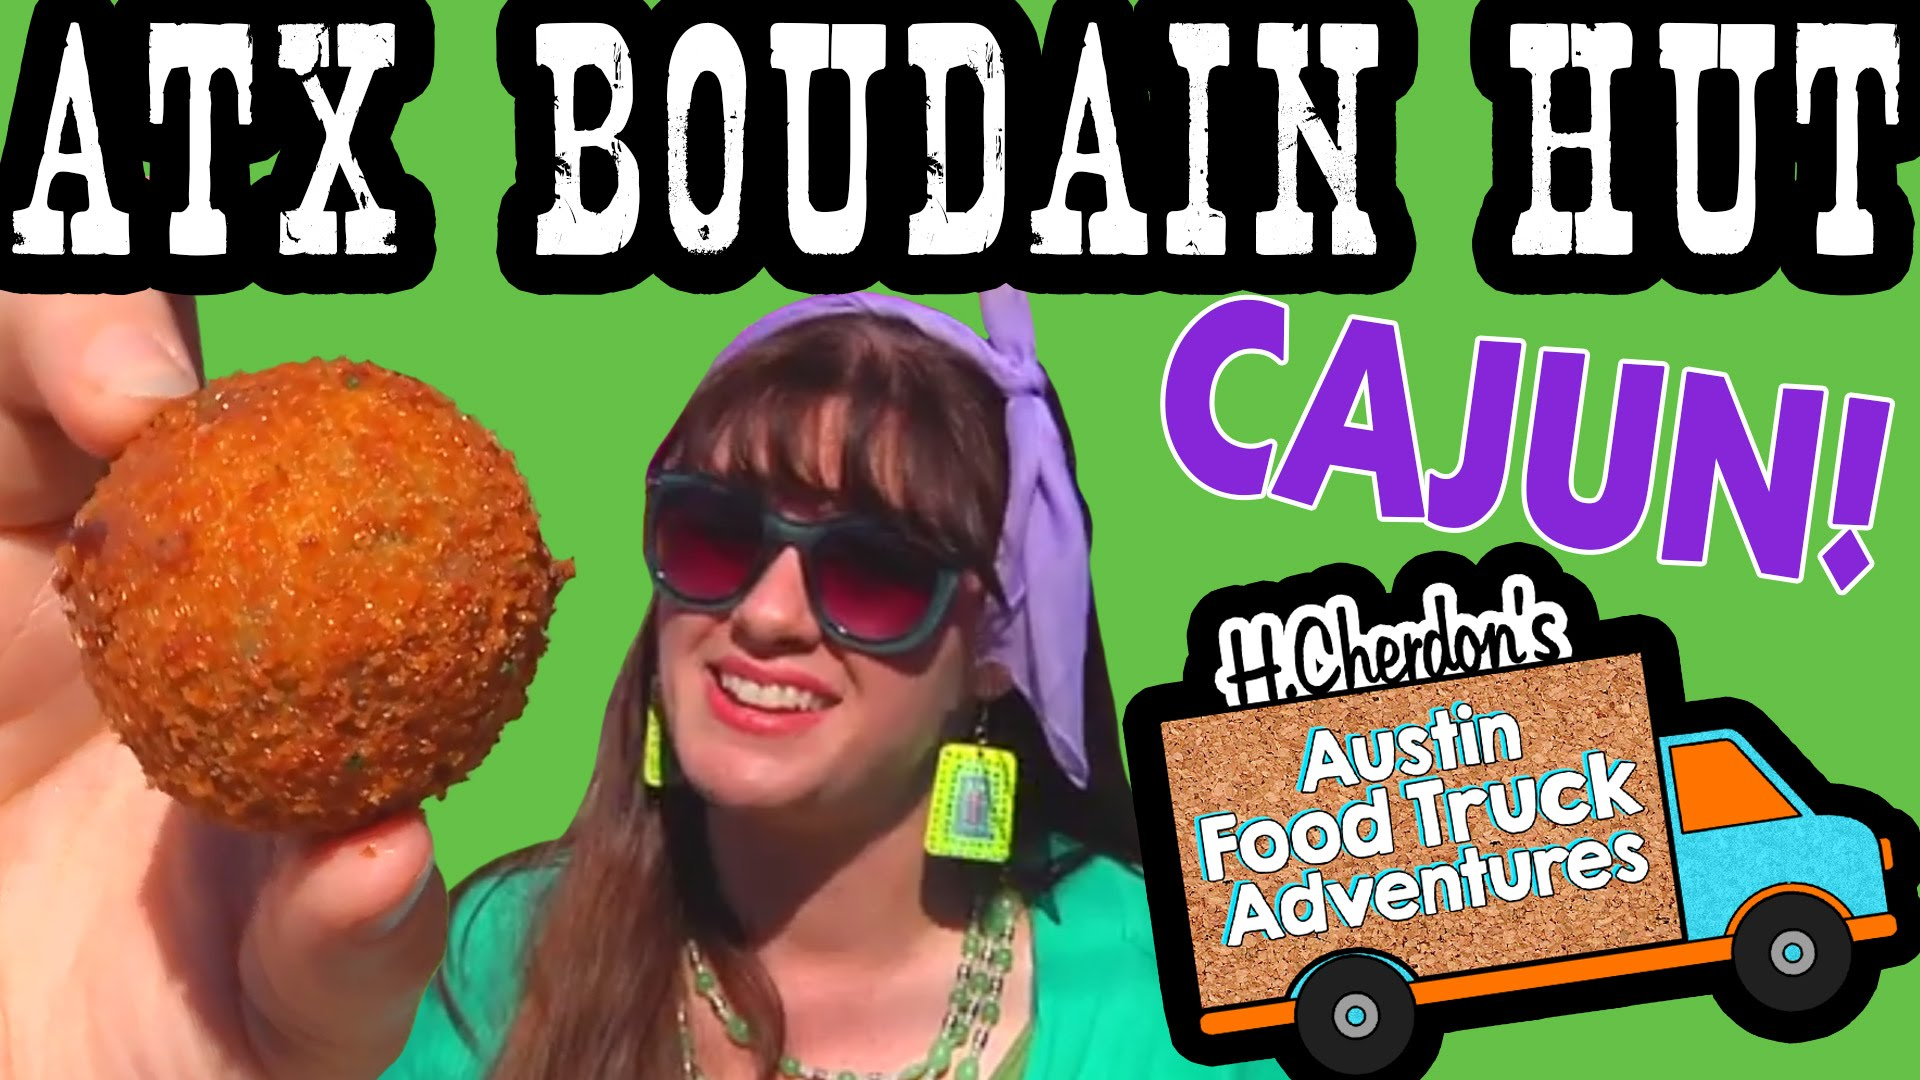 ATX Boudain Hut Boudain Balls & Gumbo, H.Cherdon's Austin Food Truck Adventures, S2 Trucklandia